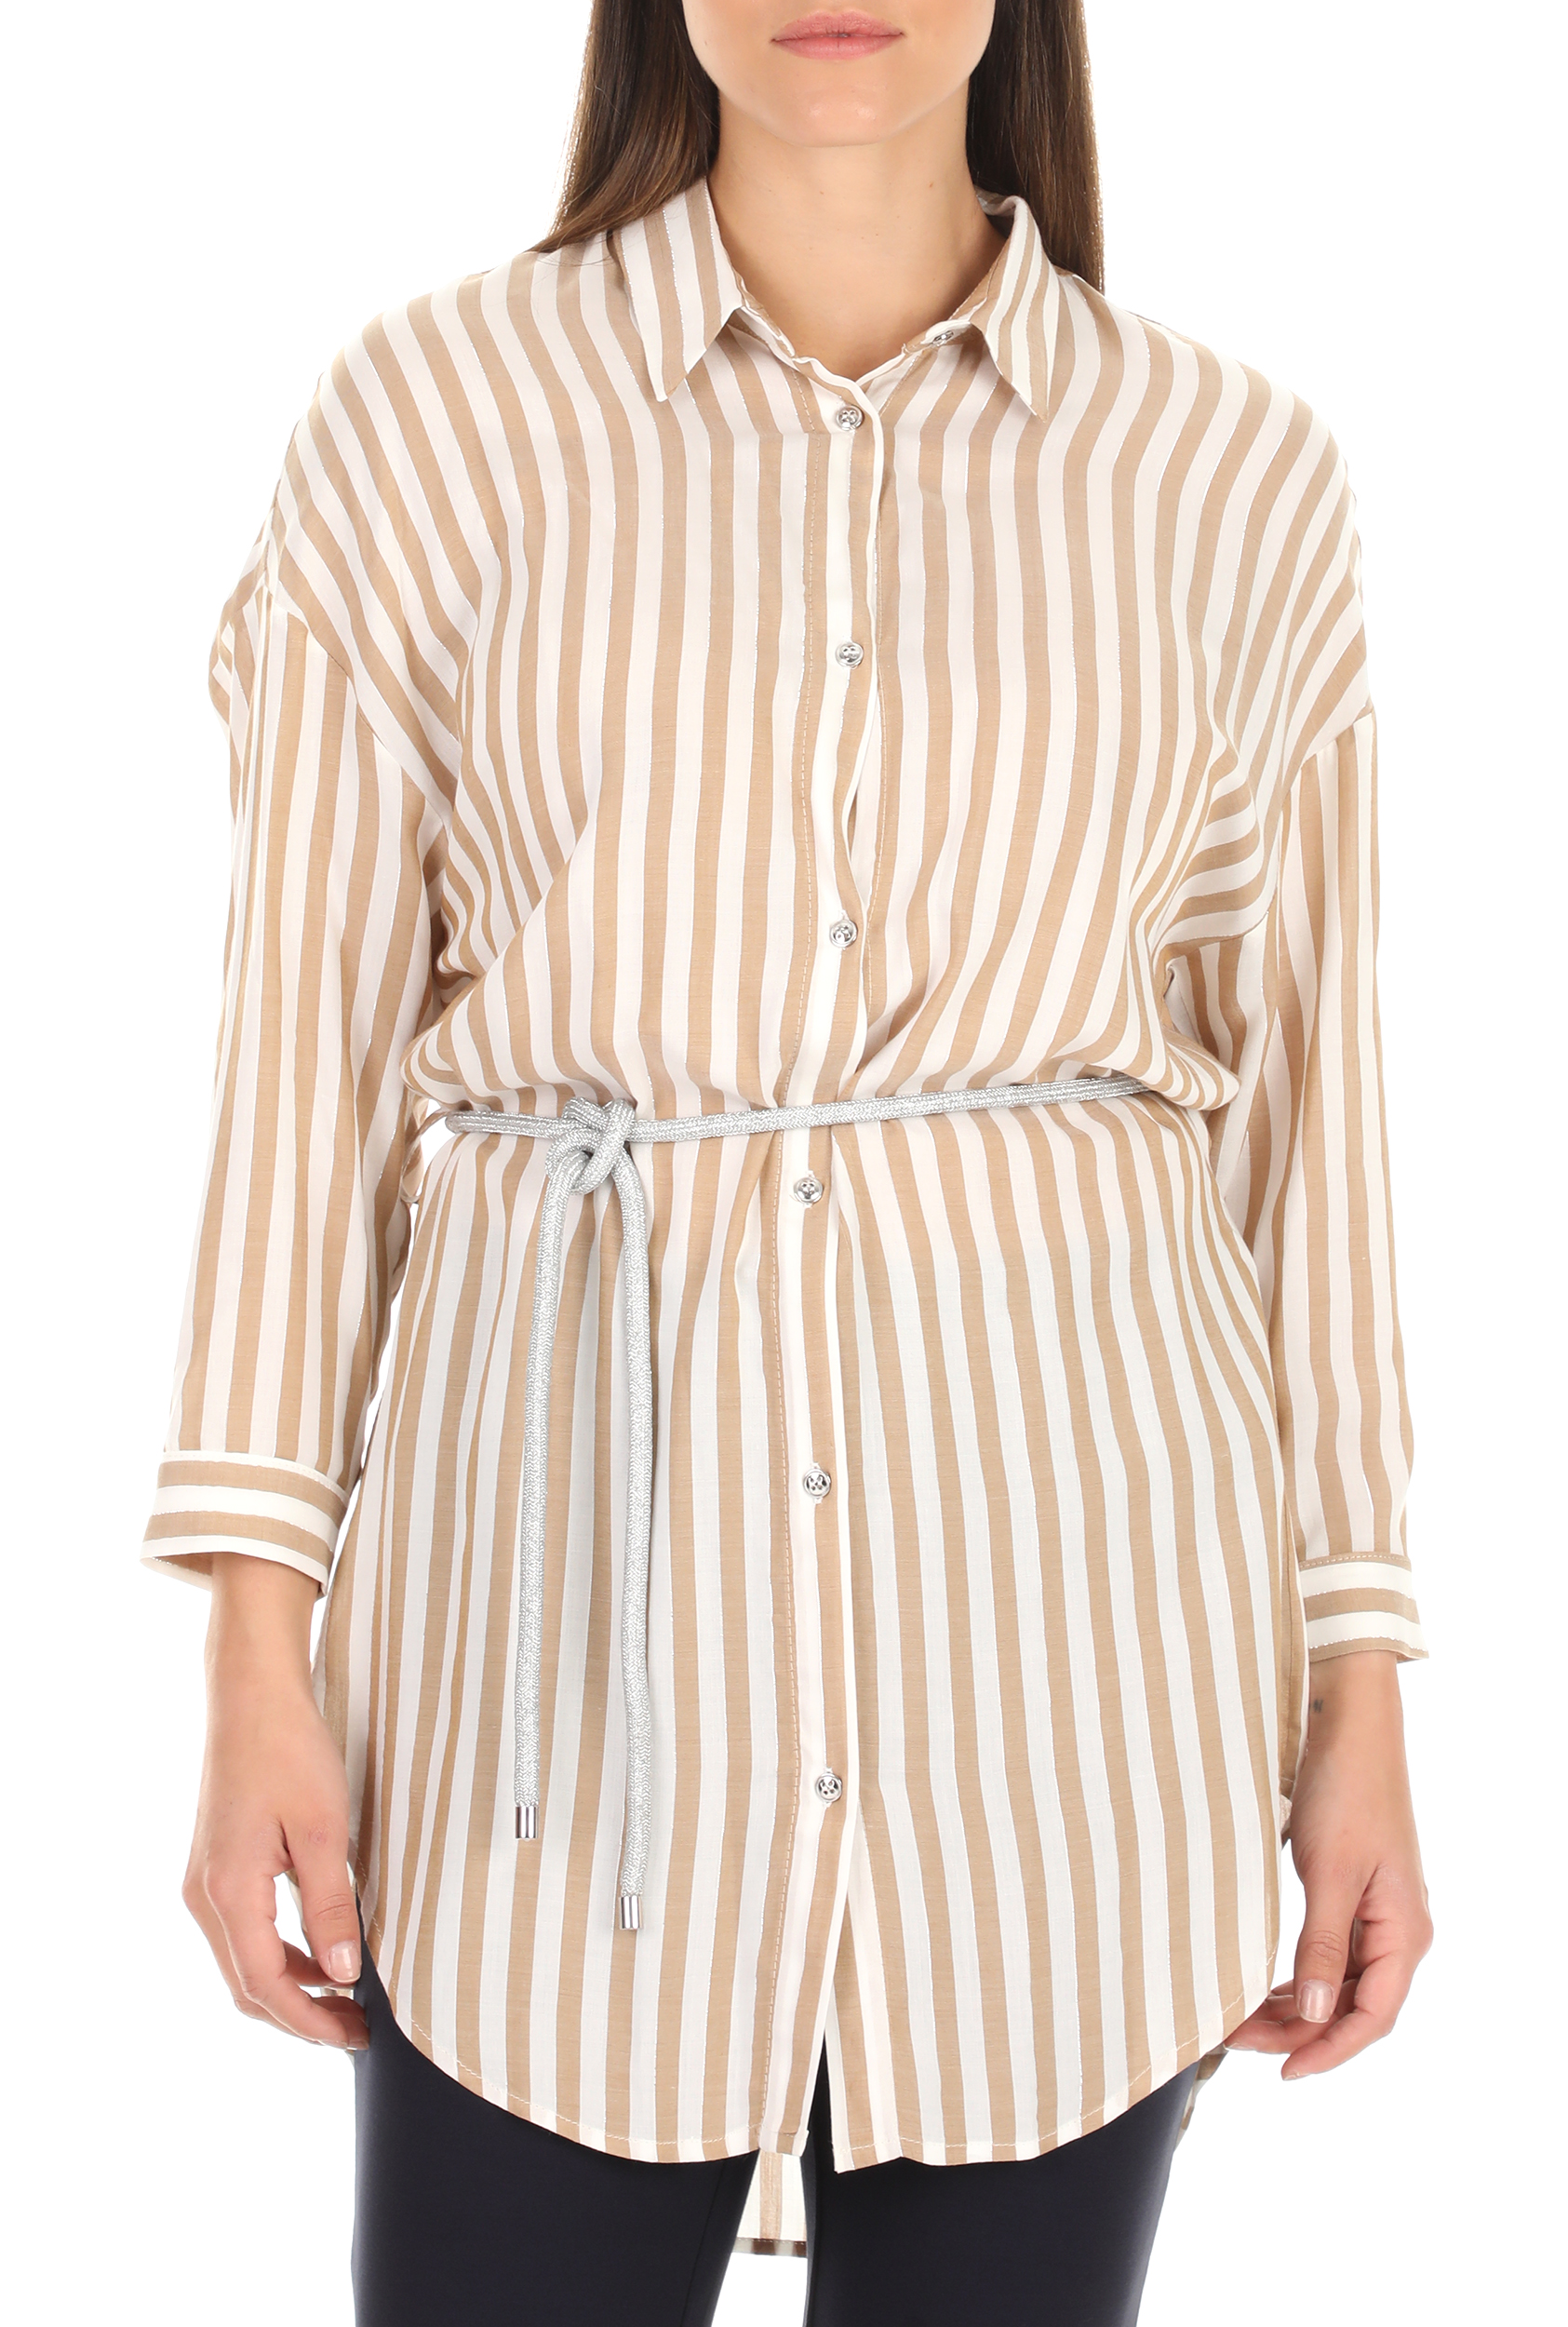 KOCCA - Γυναικείο πουκάμισο KOCCA NELLES ριγέ γυναικεία ρούχα πουκάμισα μακρυμάνικα